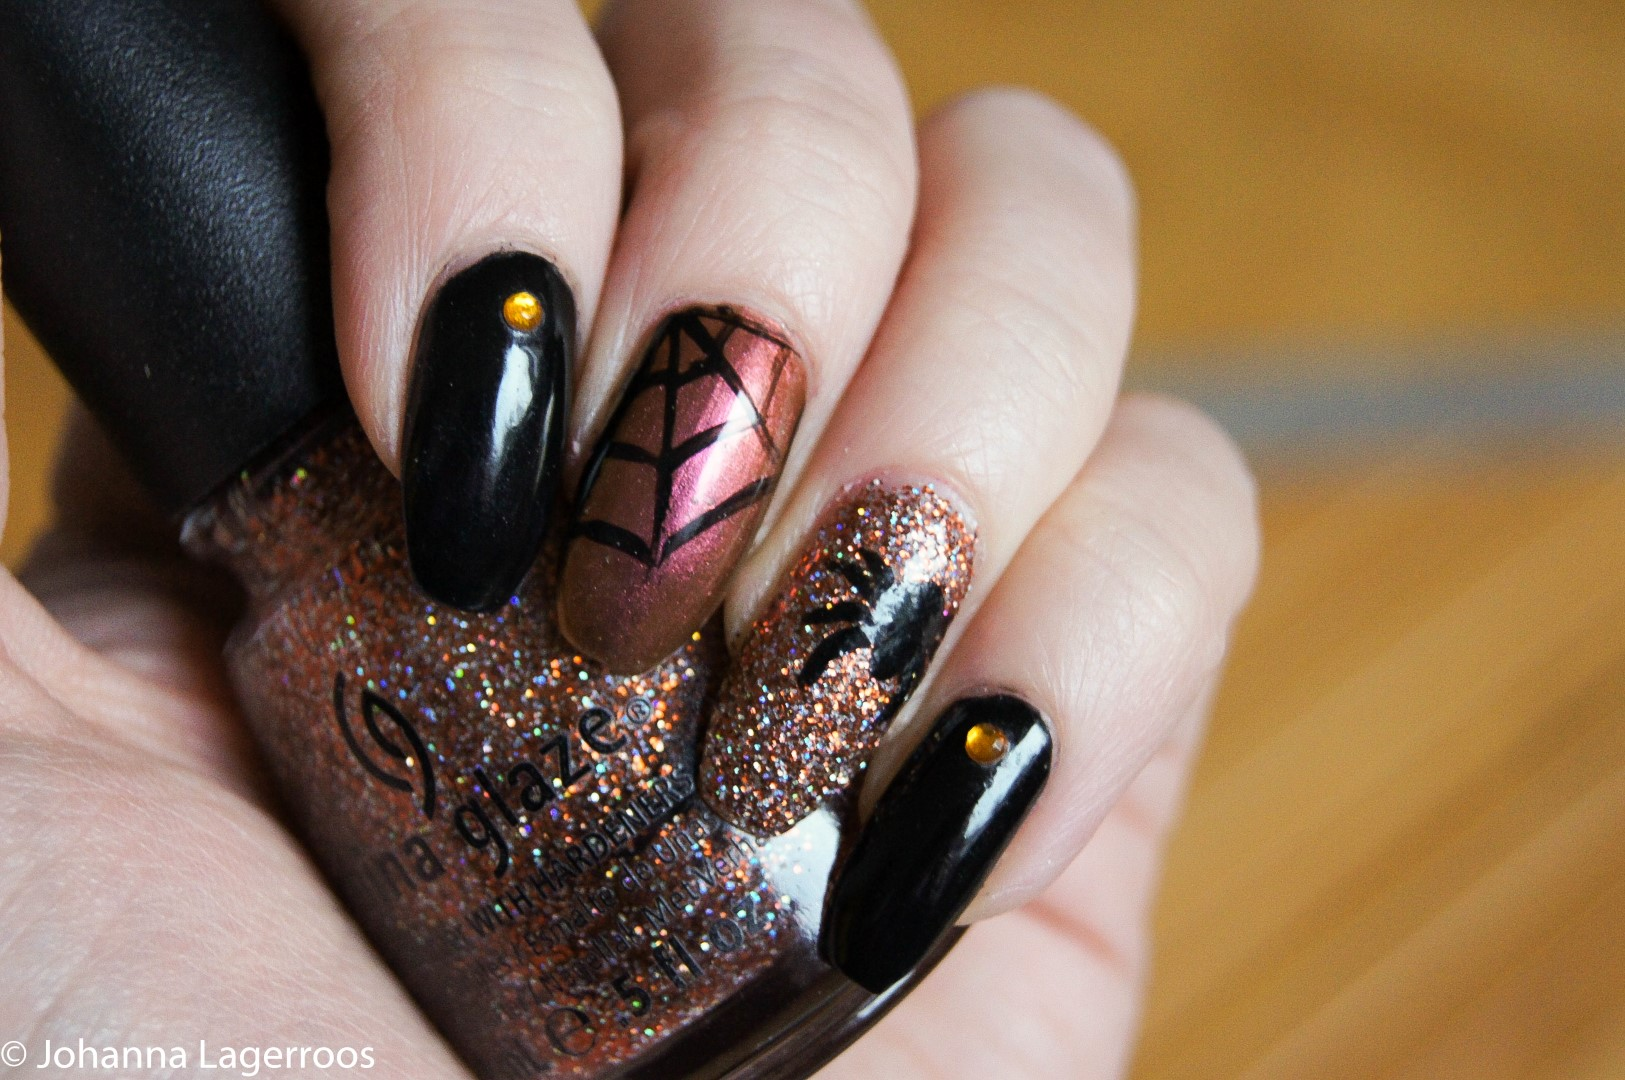 Spider nail art